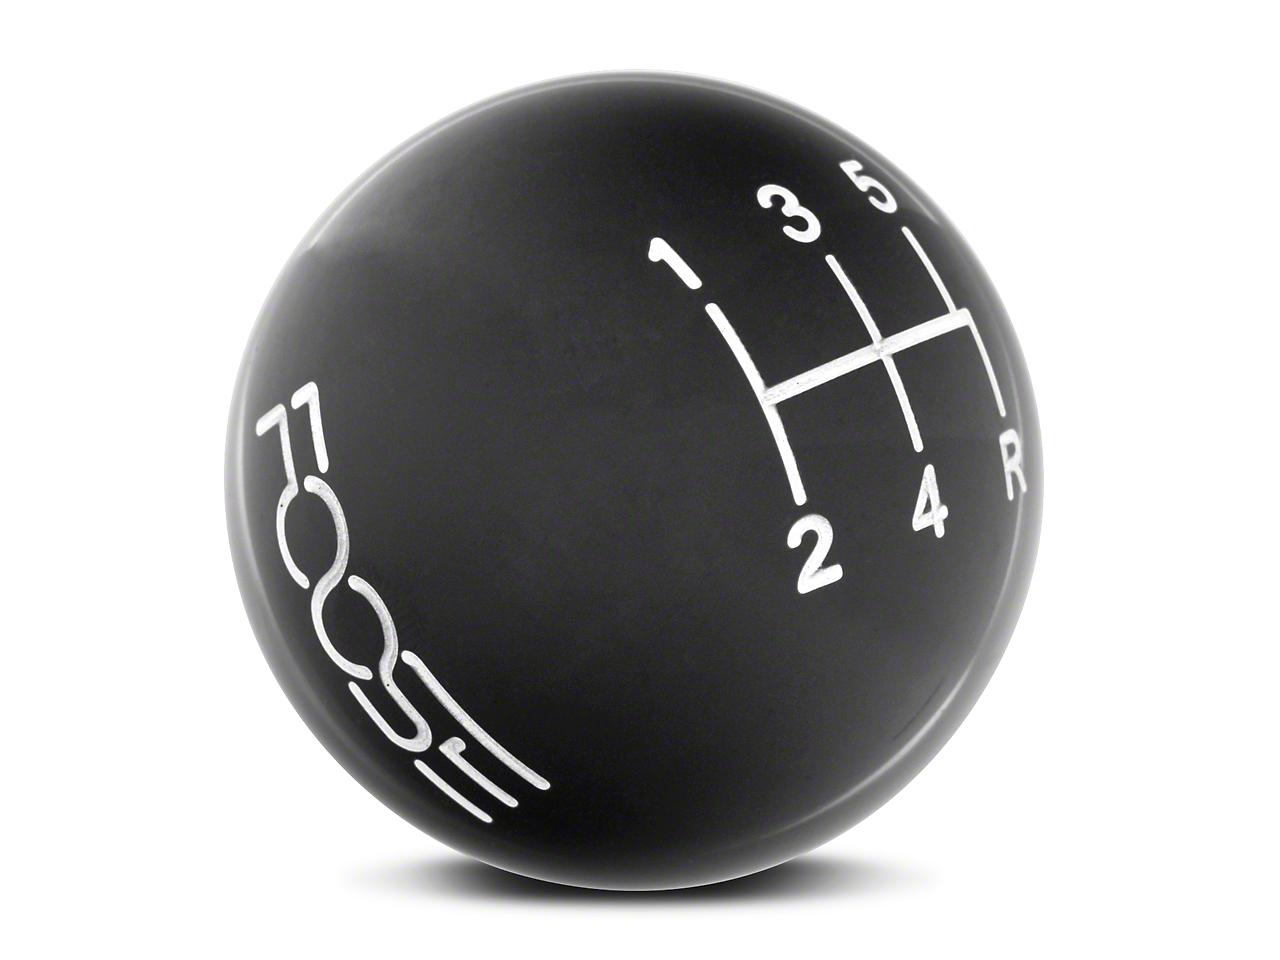 MMD by FOOSE Retro Style 5-Speed Shift Knob w/ FOOSE logo - Black (05-10 GT, V6)